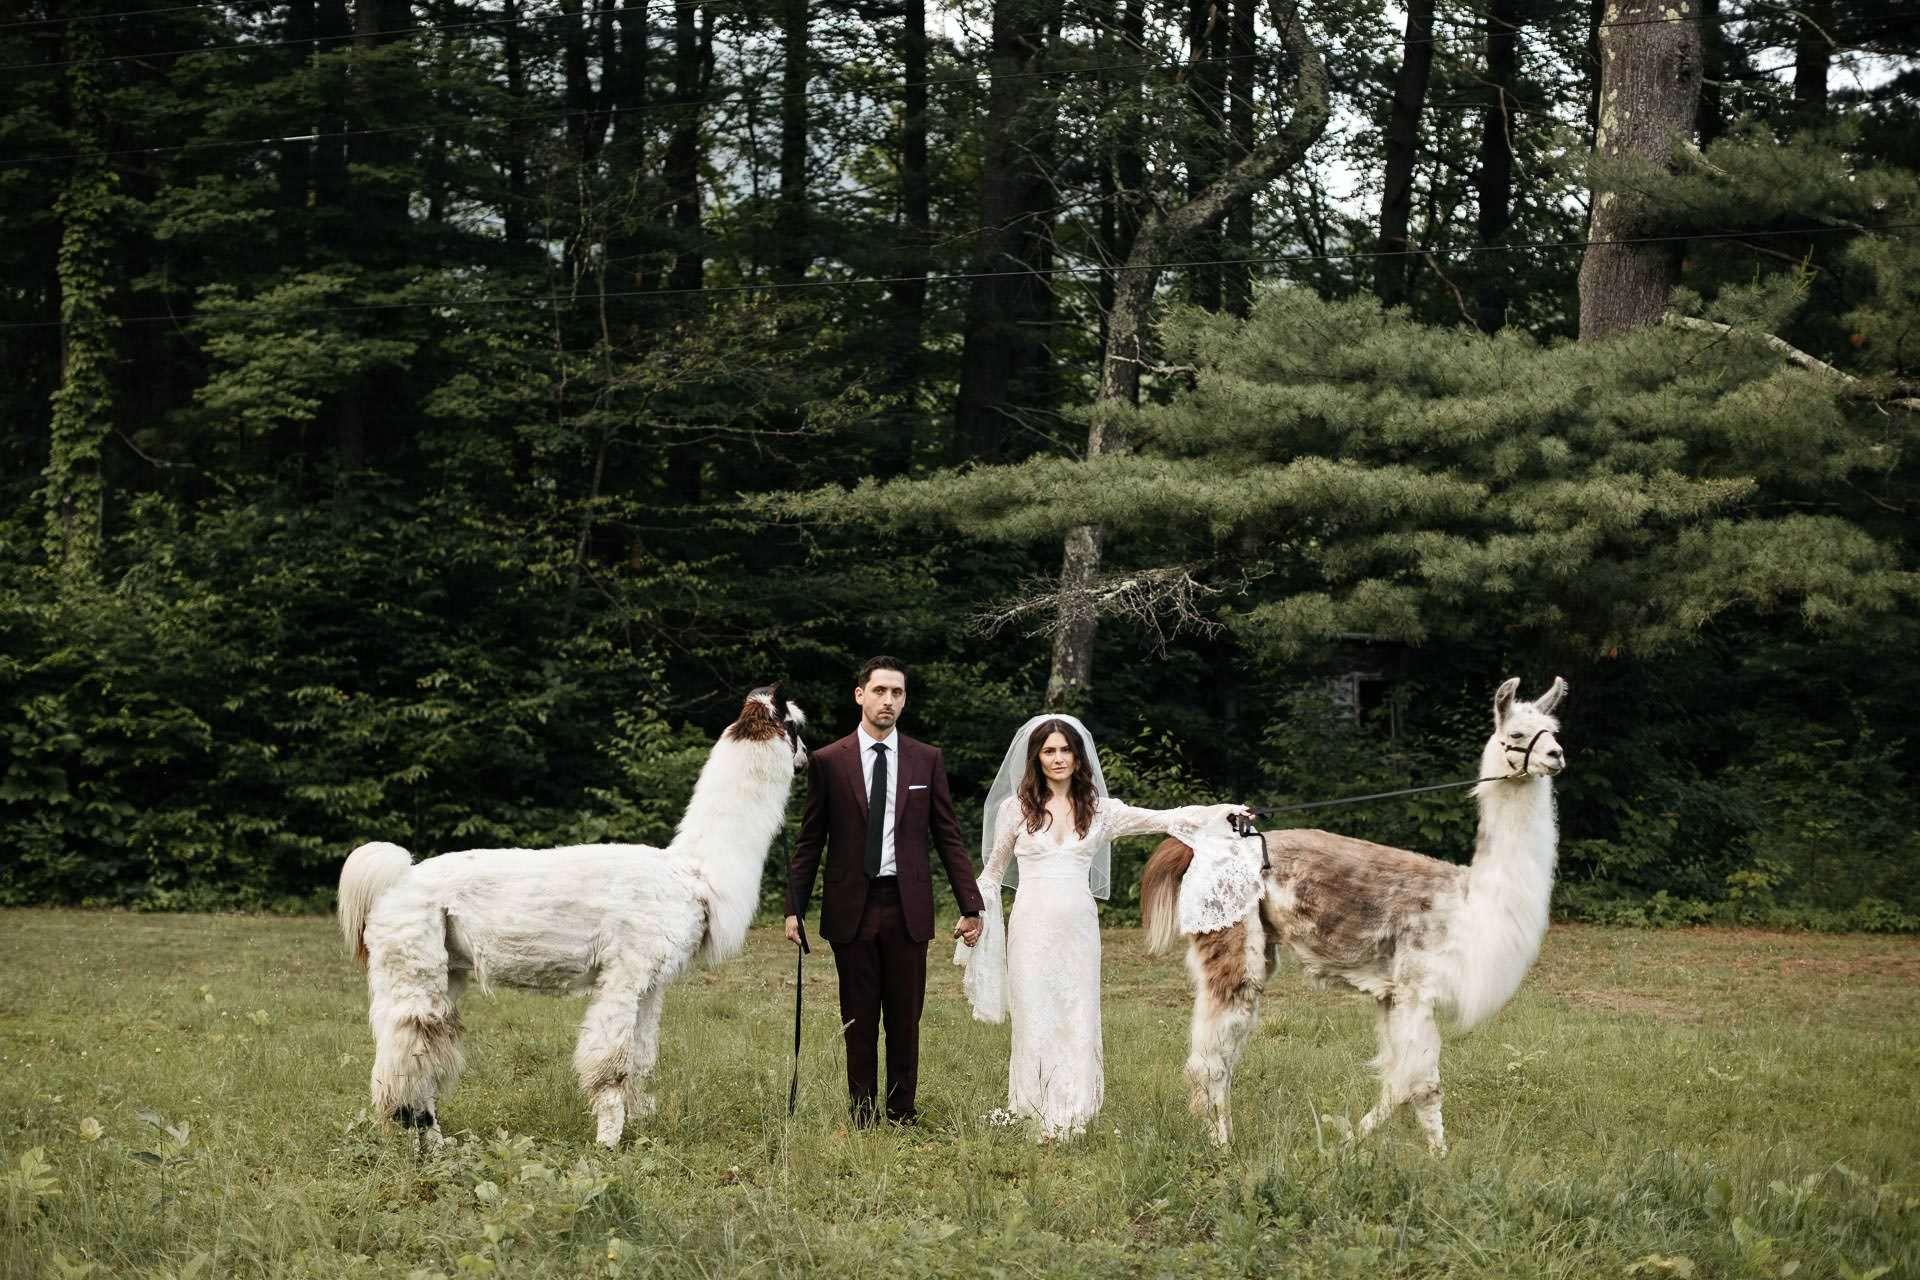 Rachel & David's Wedding . Foxfire Mountain House, Mount Tremper NY